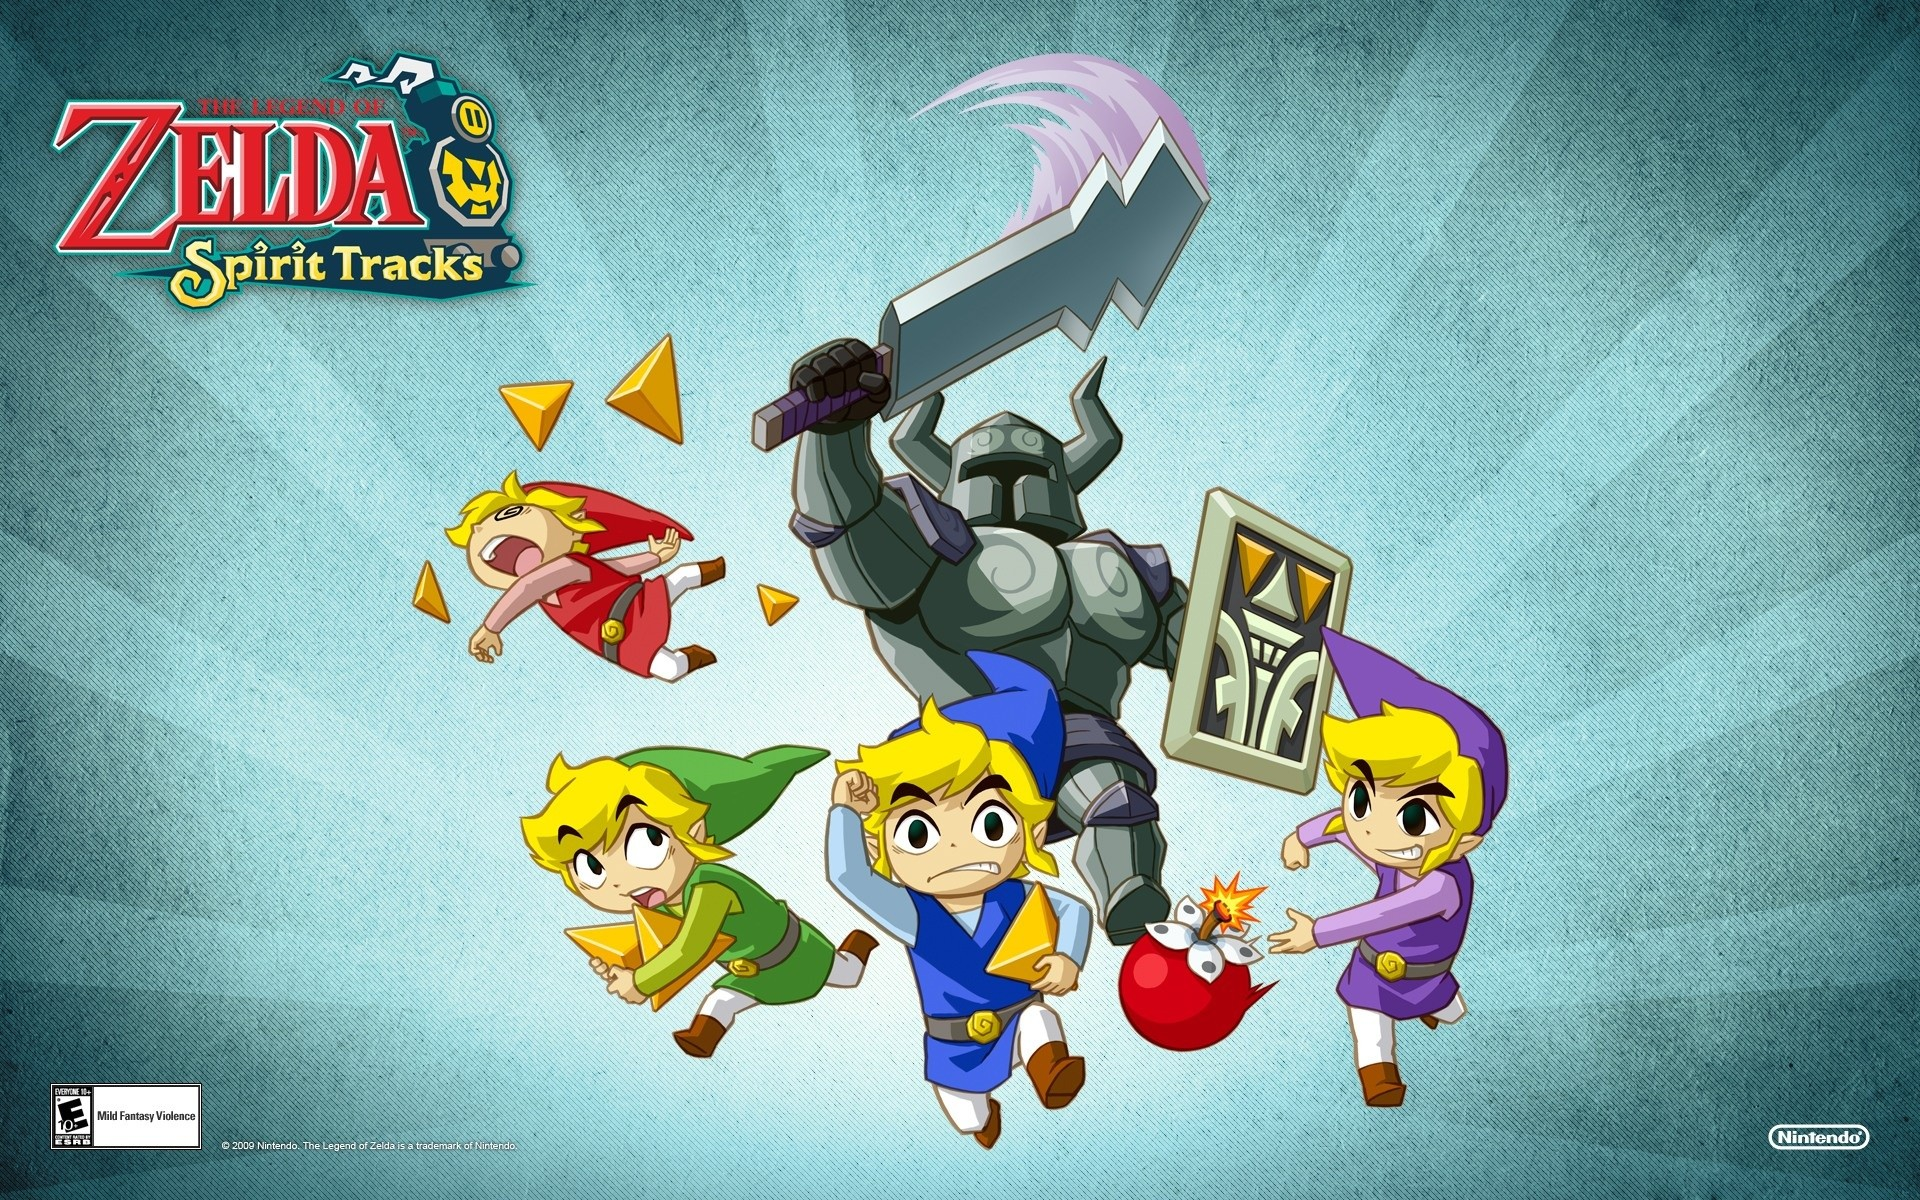 The Legend of Zelda Wallpaper HD Widescreen.